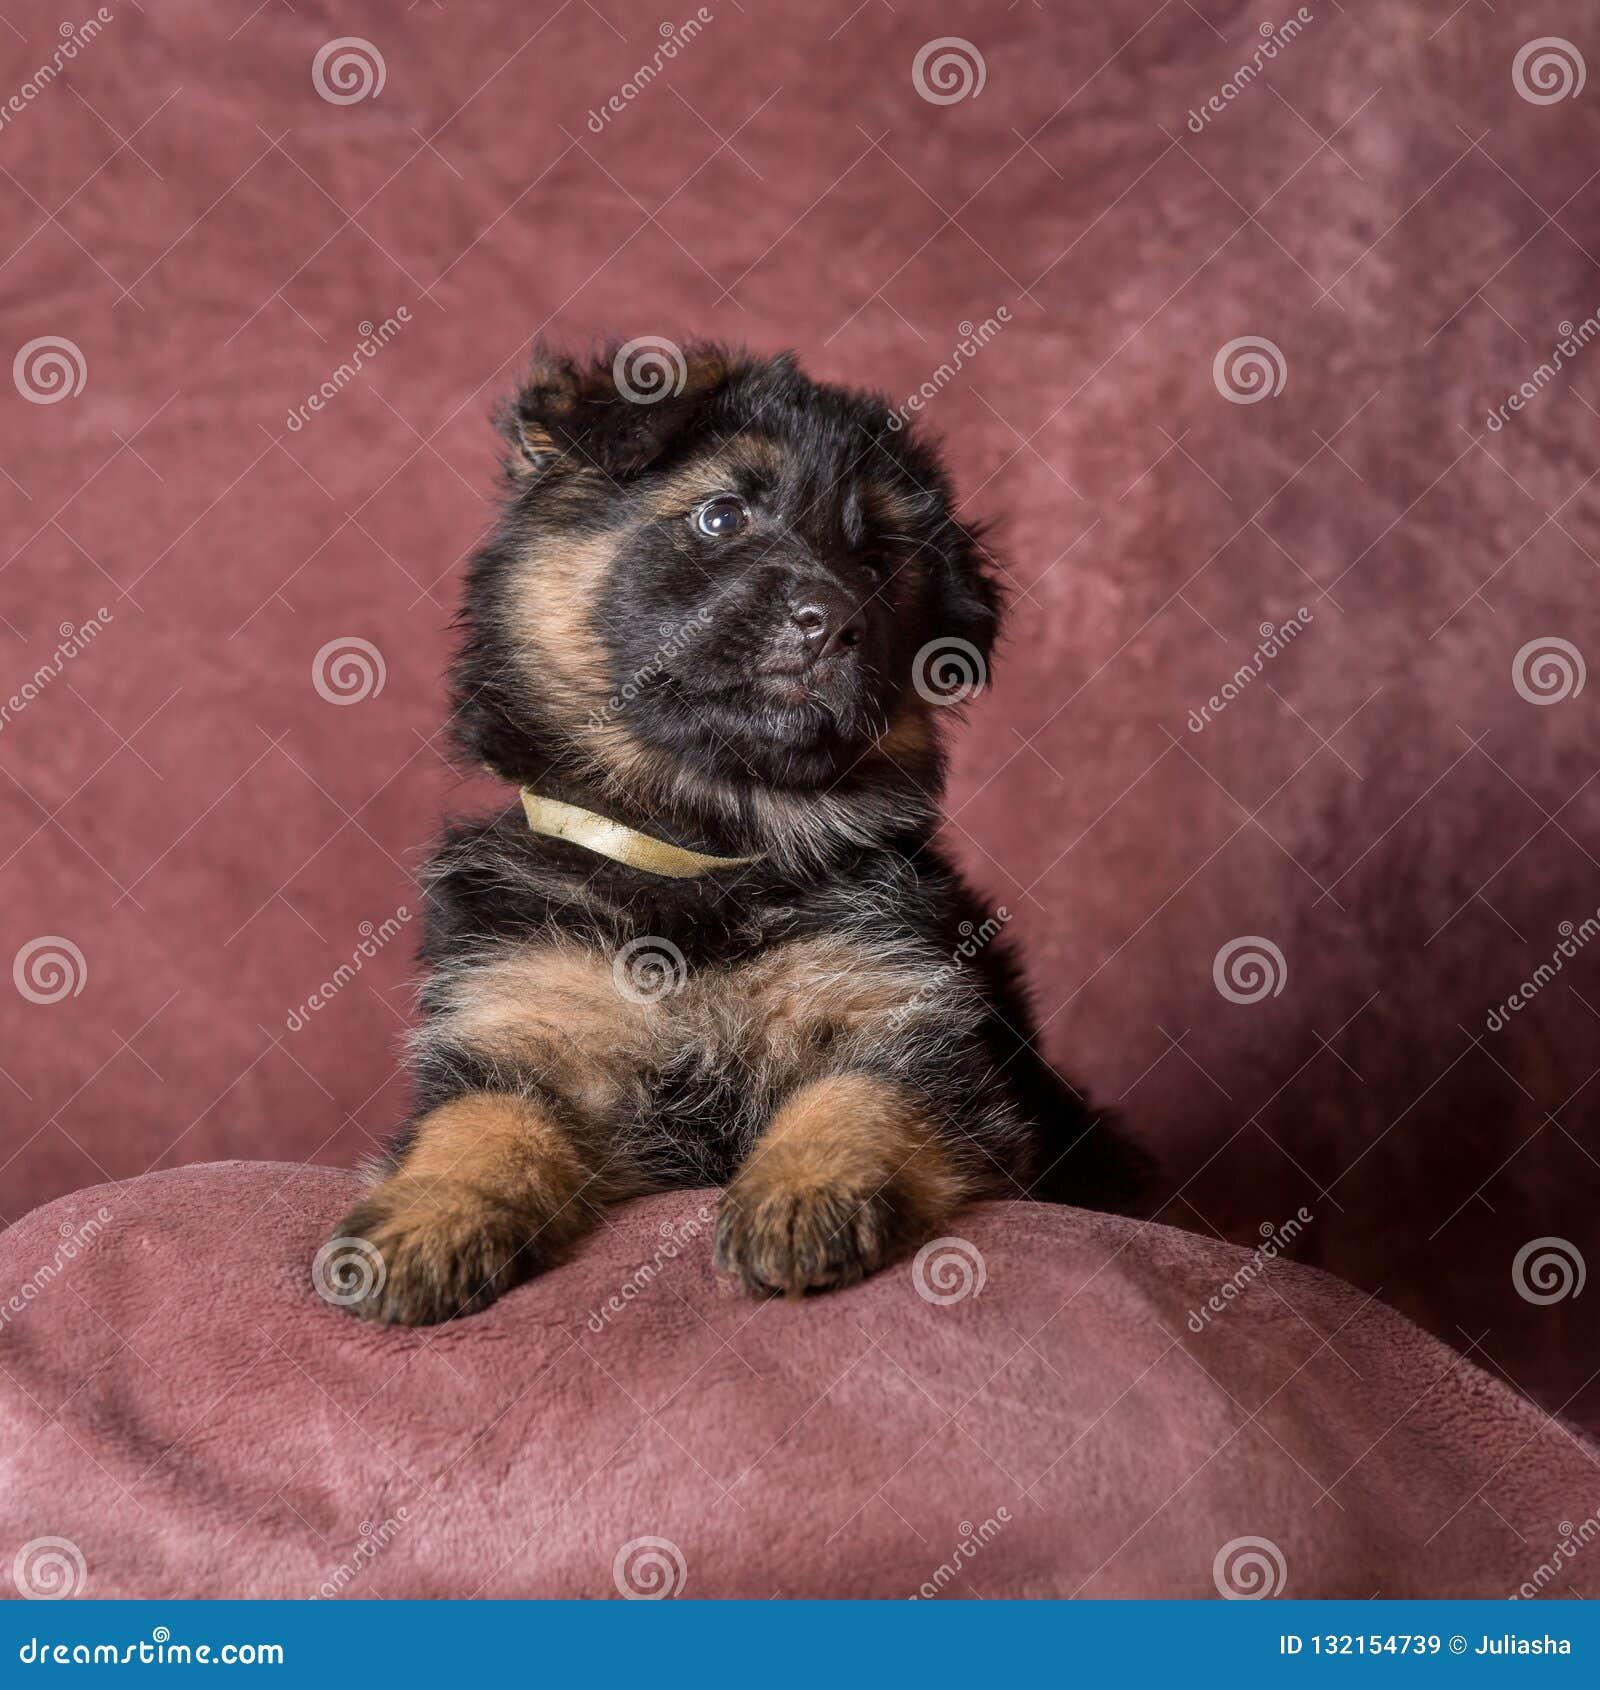 Long Haired German Shepherd Puppy Studio Portrait Stock Image Image Of Mammal Domestic 132154739